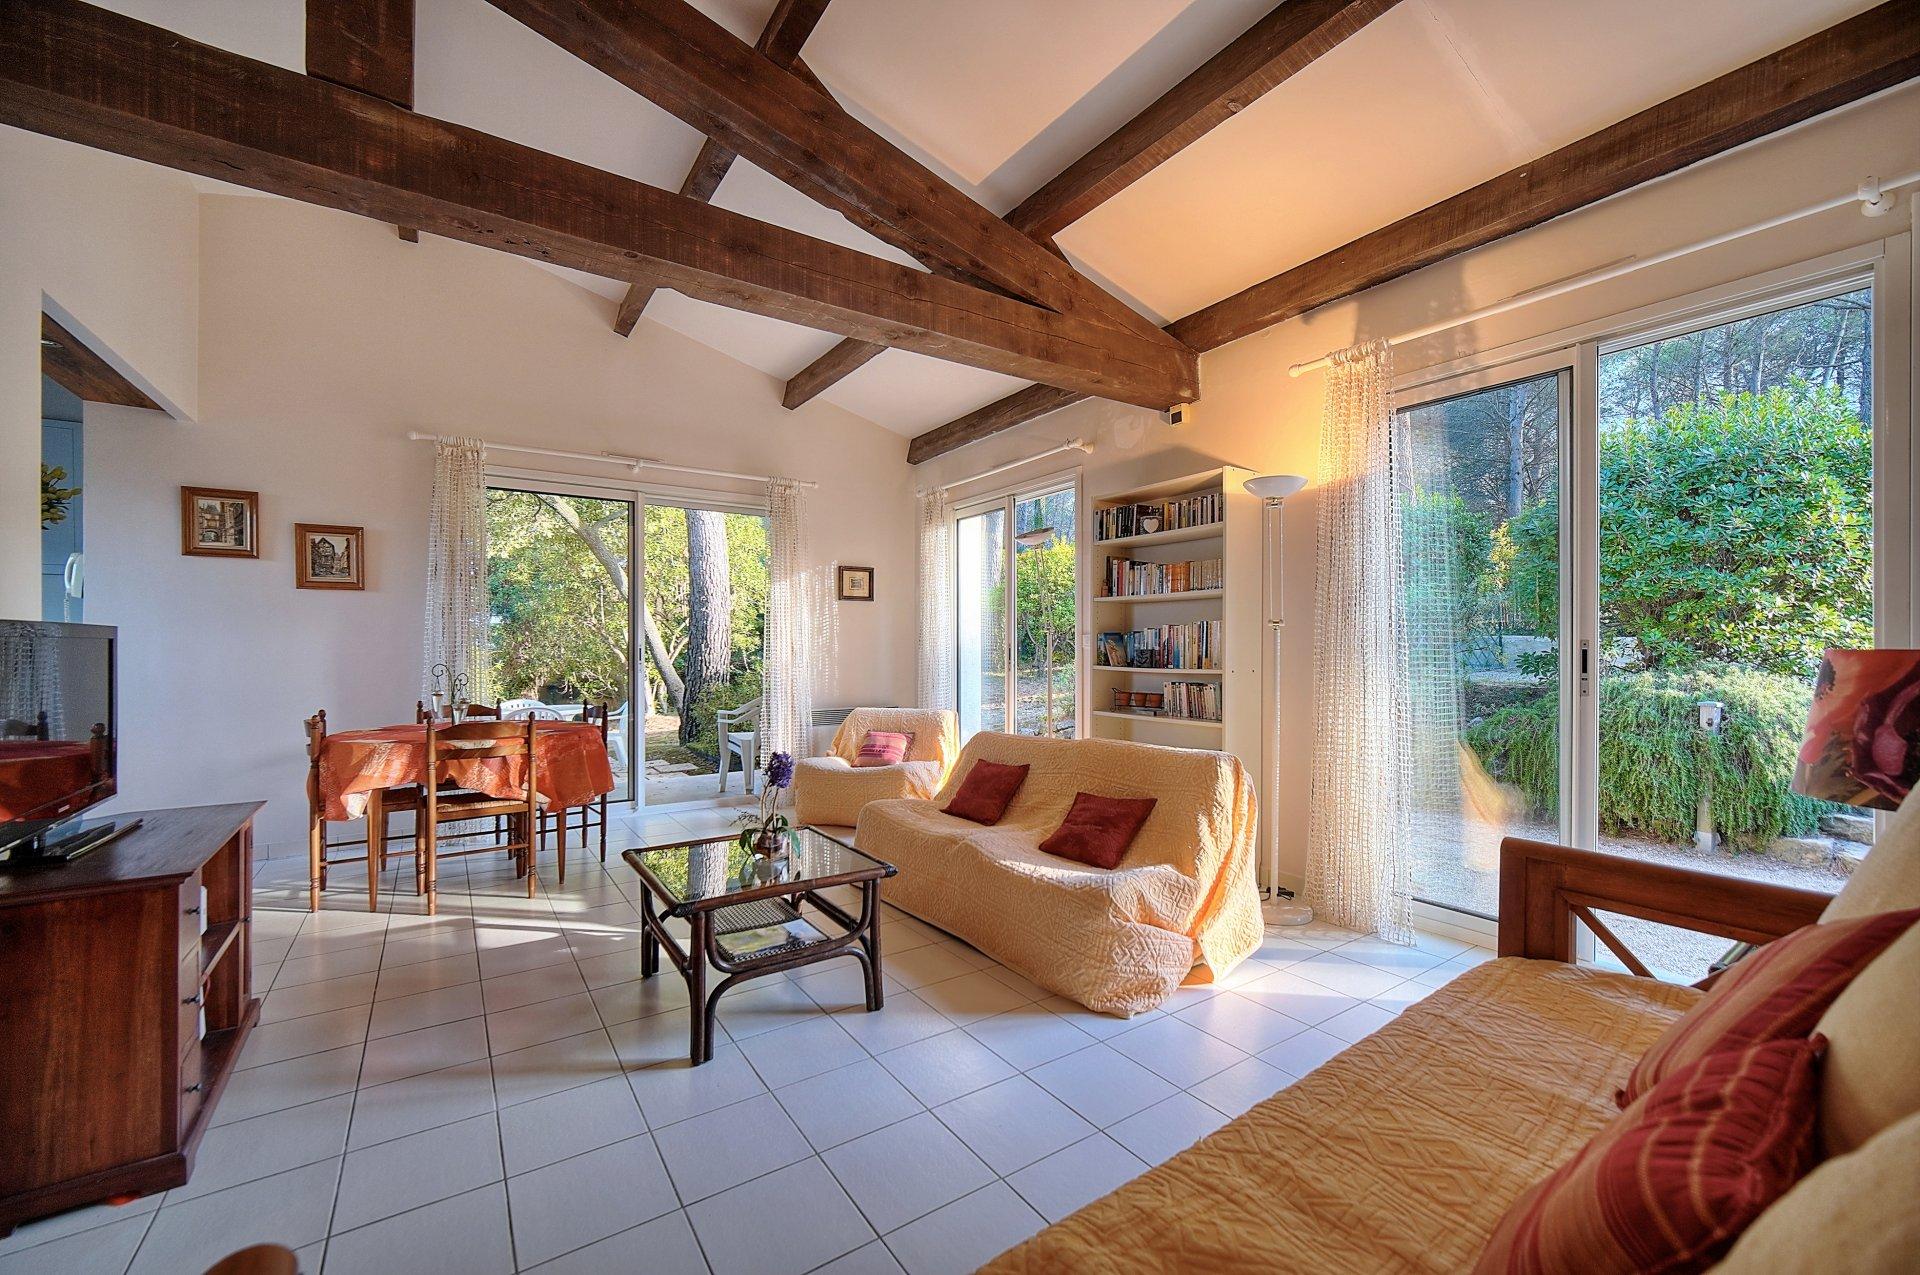 Valbonne - Single storey villa in a dominant position